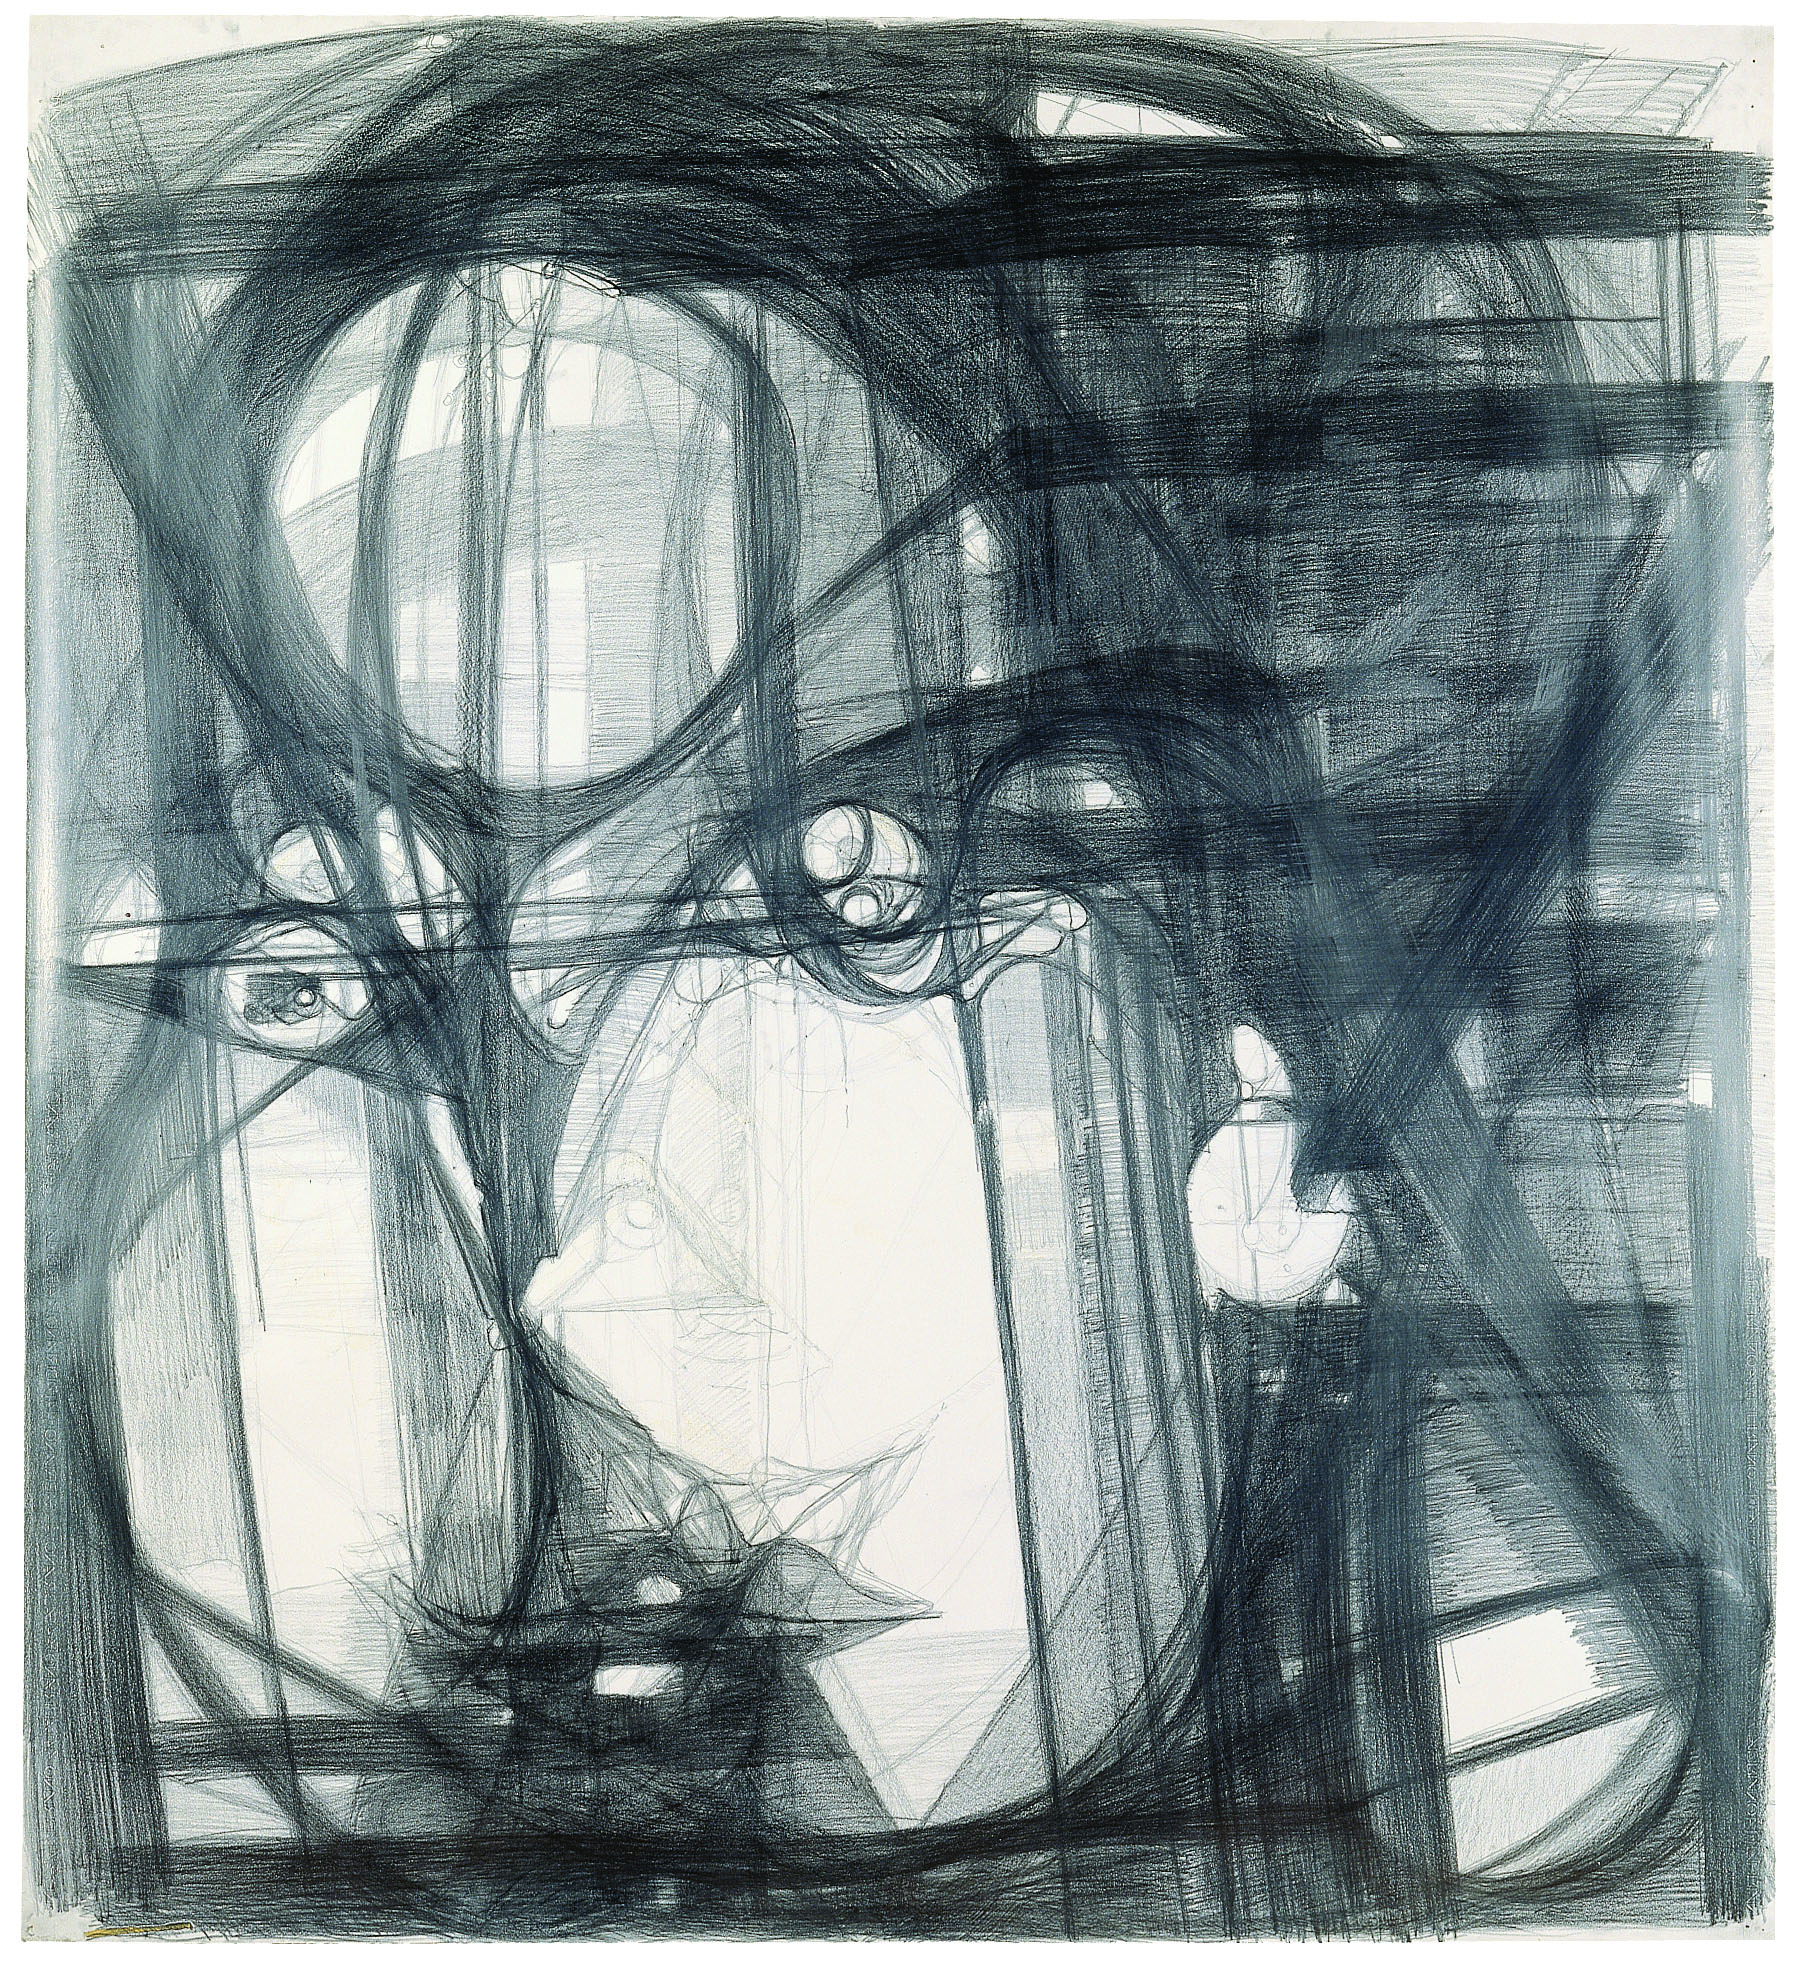 Marisa Merz, Untitled, 1993–96 Graphite on paper Kunstmuseum Winterthur Purchased with funds from the Lottery Fund of the Canton of Zurich, 1999 © Schweizerisches Institut fur Kunstwissenschaft, Zurich, Jean-Pierre Kuhn